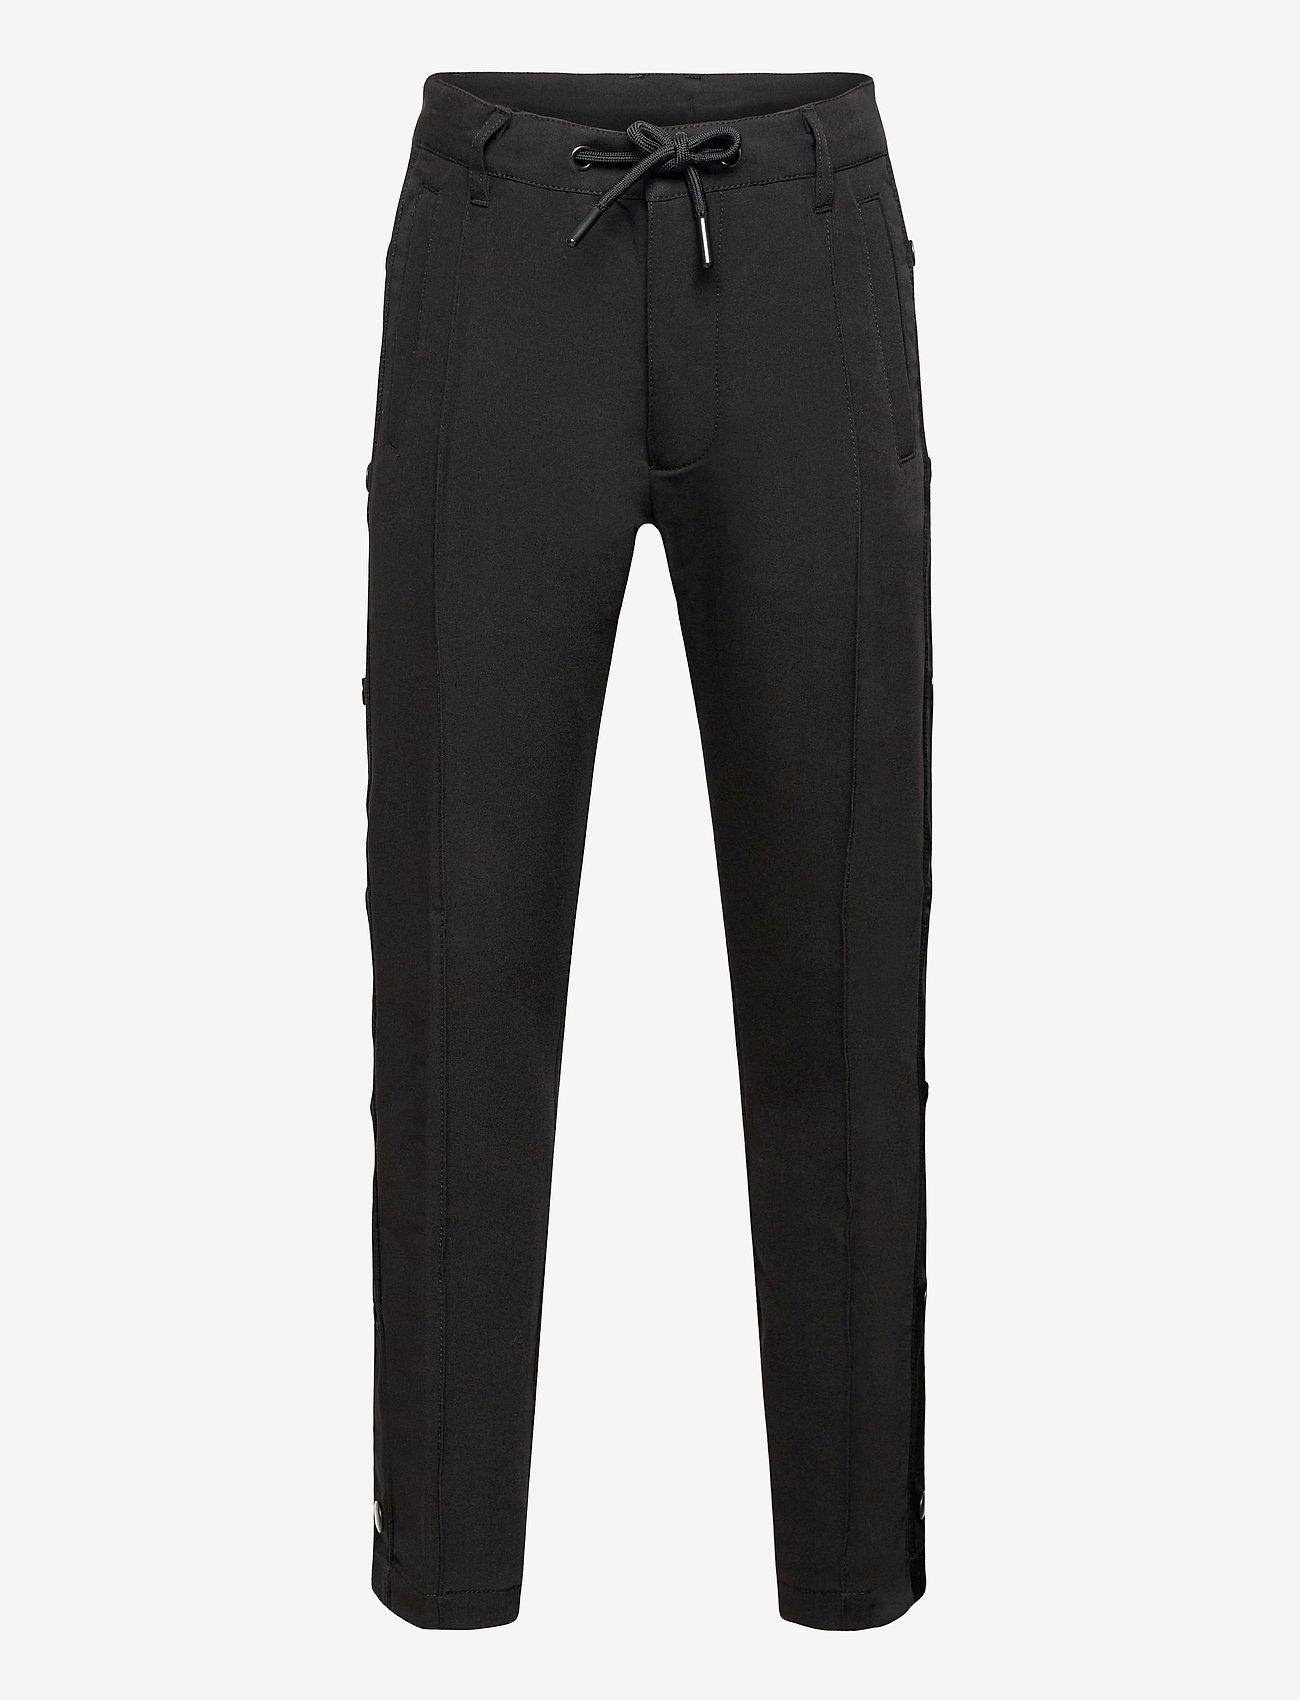 Diesel - PMARLEN TROUSERS - trousers - nero - 0